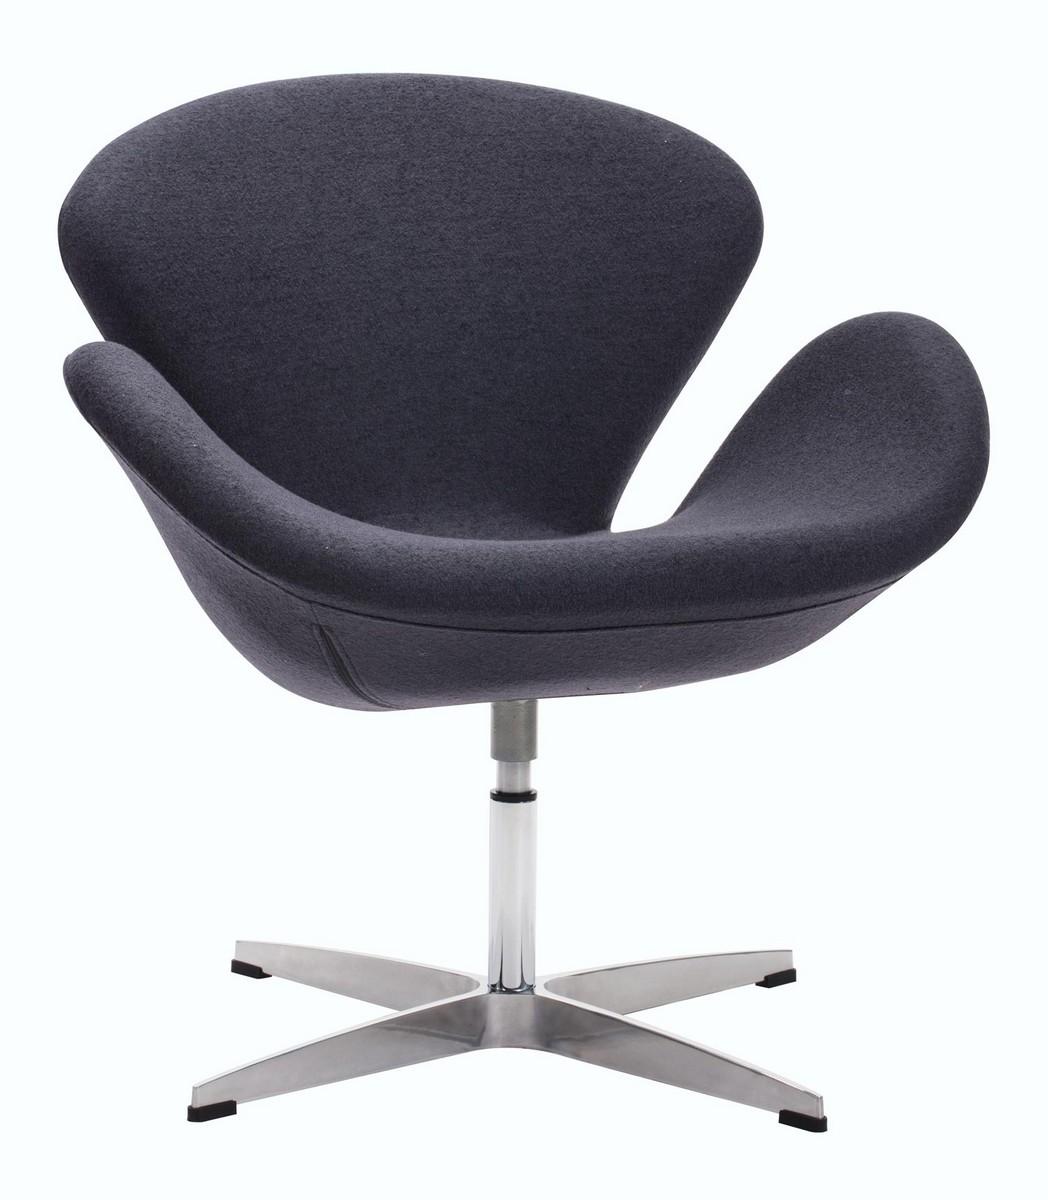 Zuo Modern Pori Occasional Chair - Iron Gray